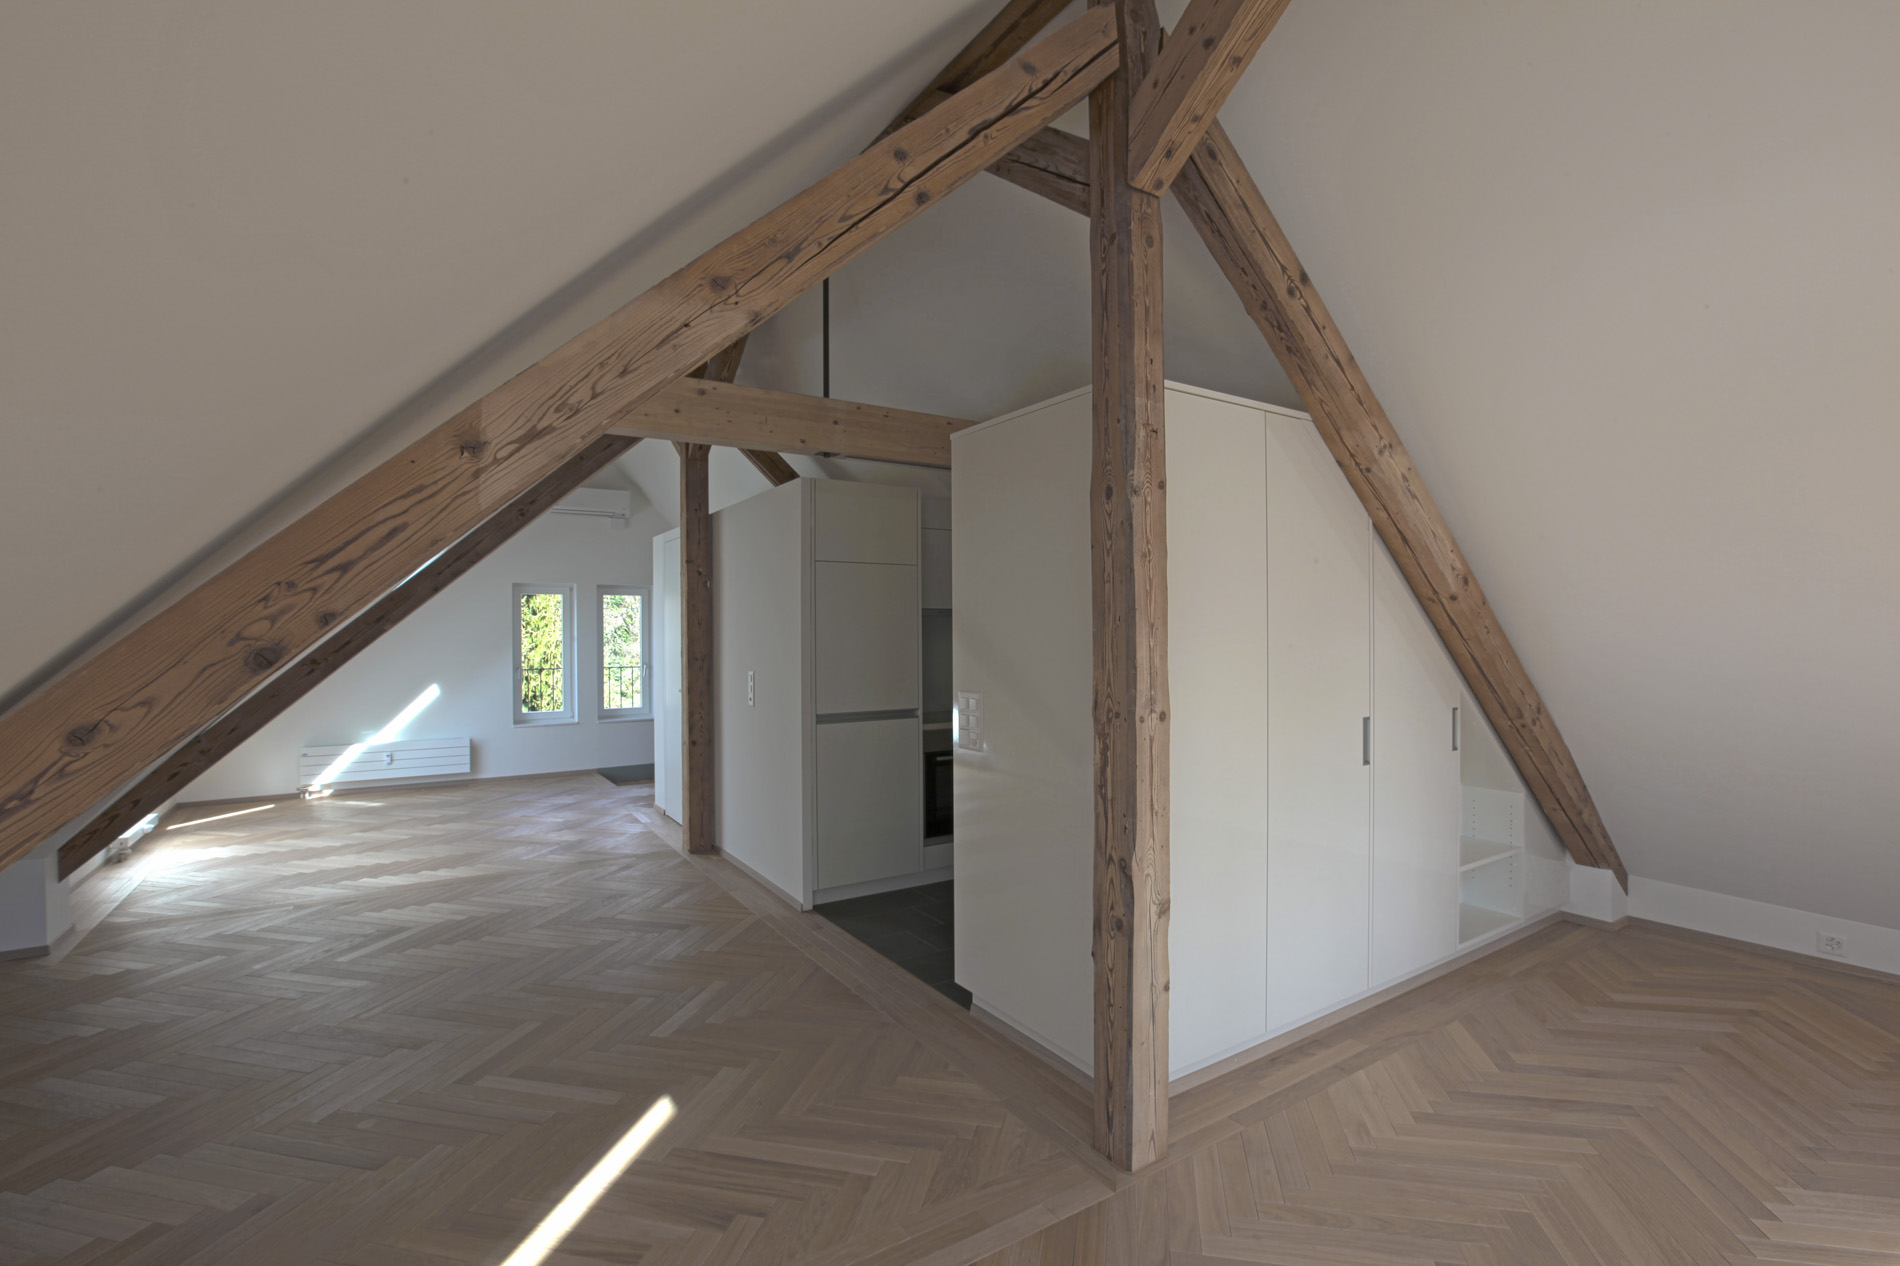 Innenarchitektur Rapperswil roskothen architekten sia gmbh